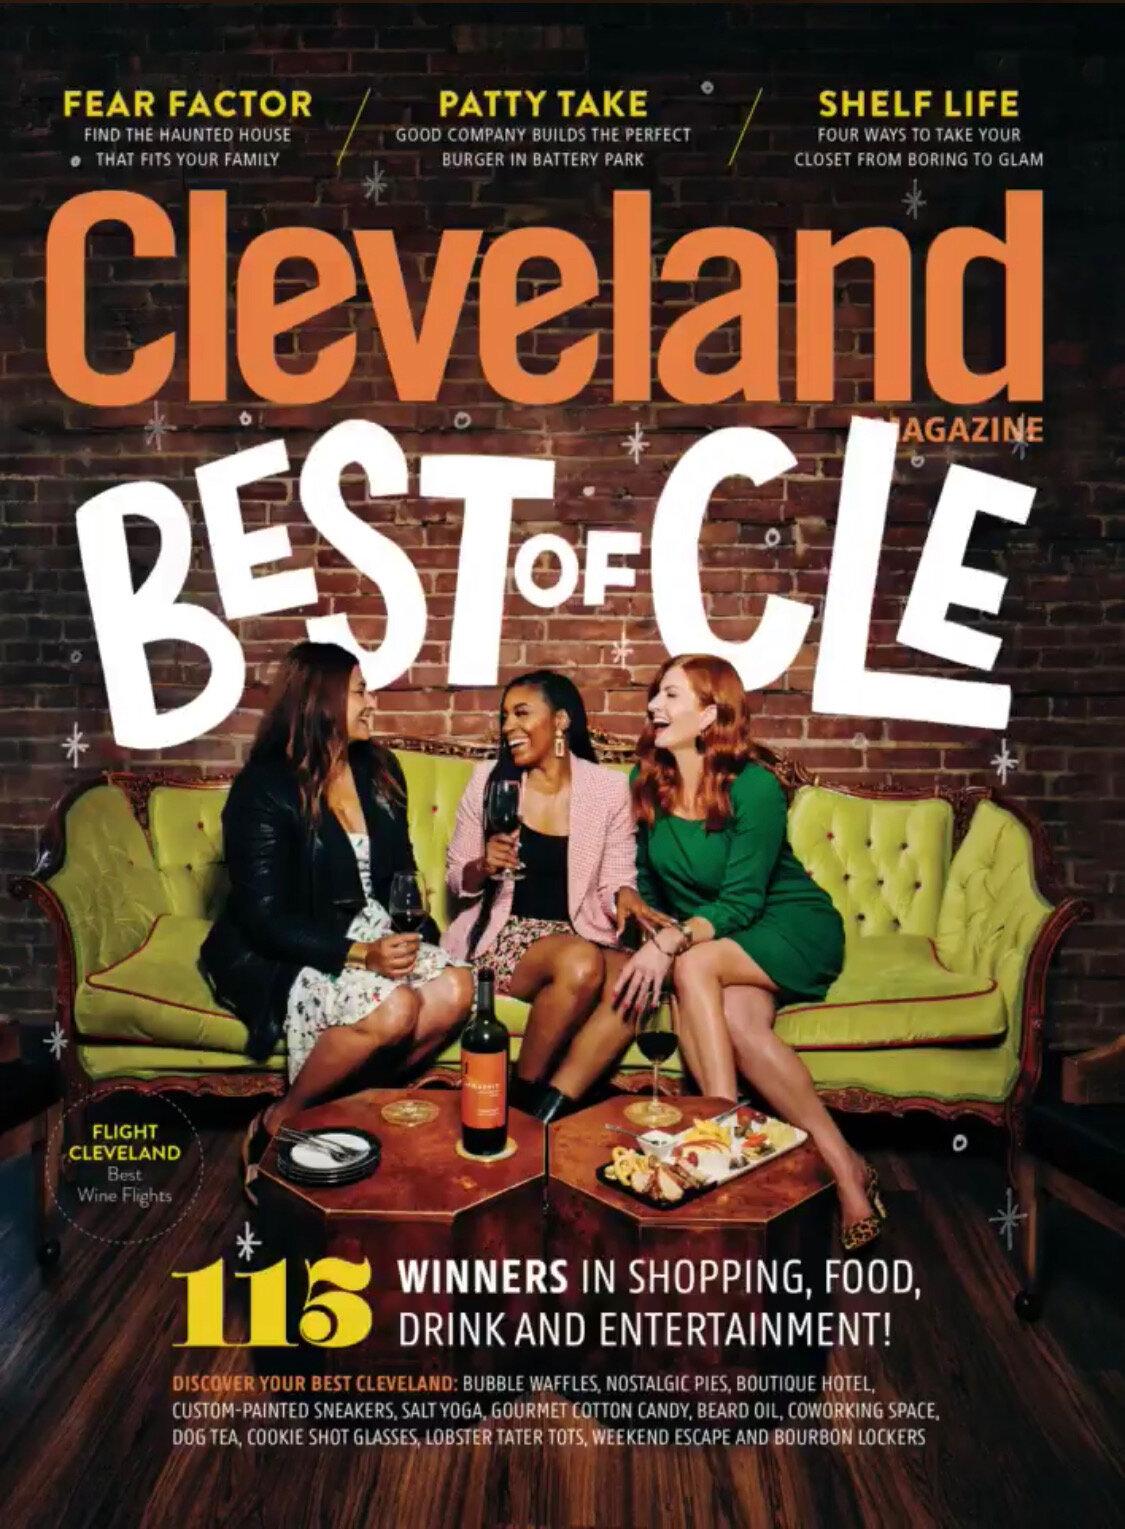 Best of Cleveland Magazine cover shoot 2019.JPG